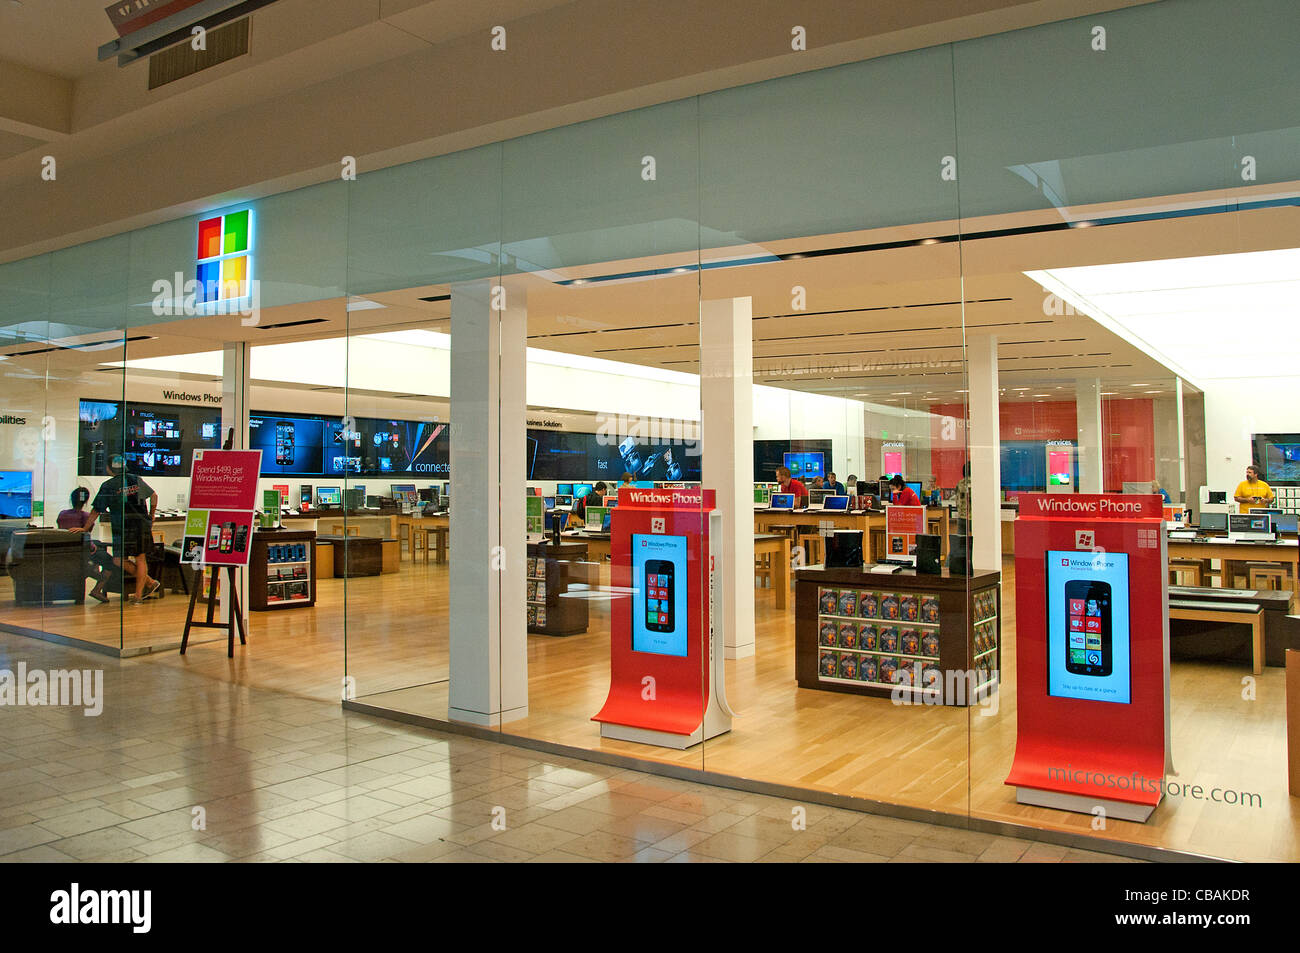 Building 92 microsoft store - Windows Phone Microsoft Shopping Mall Shop Store Computer Phone United States Stock Image